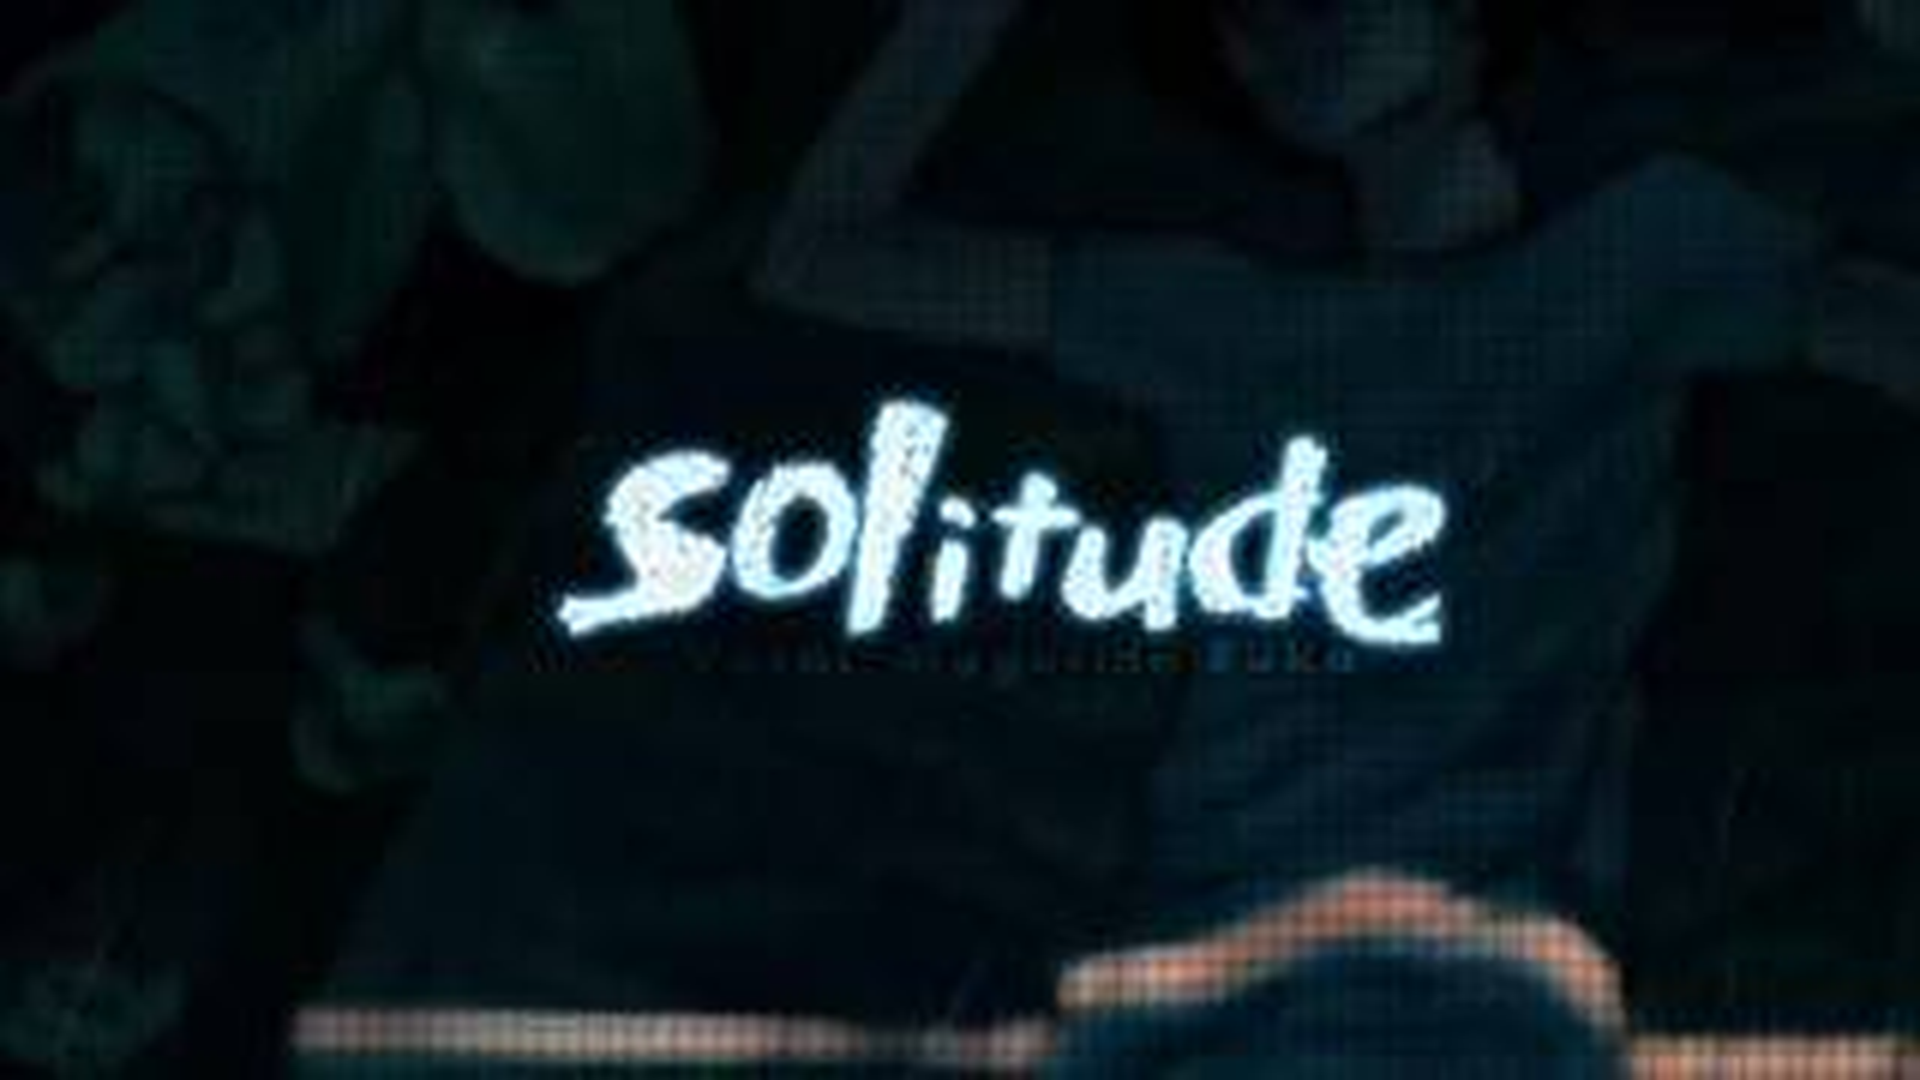 solitude (翻自:巡音ルカ)